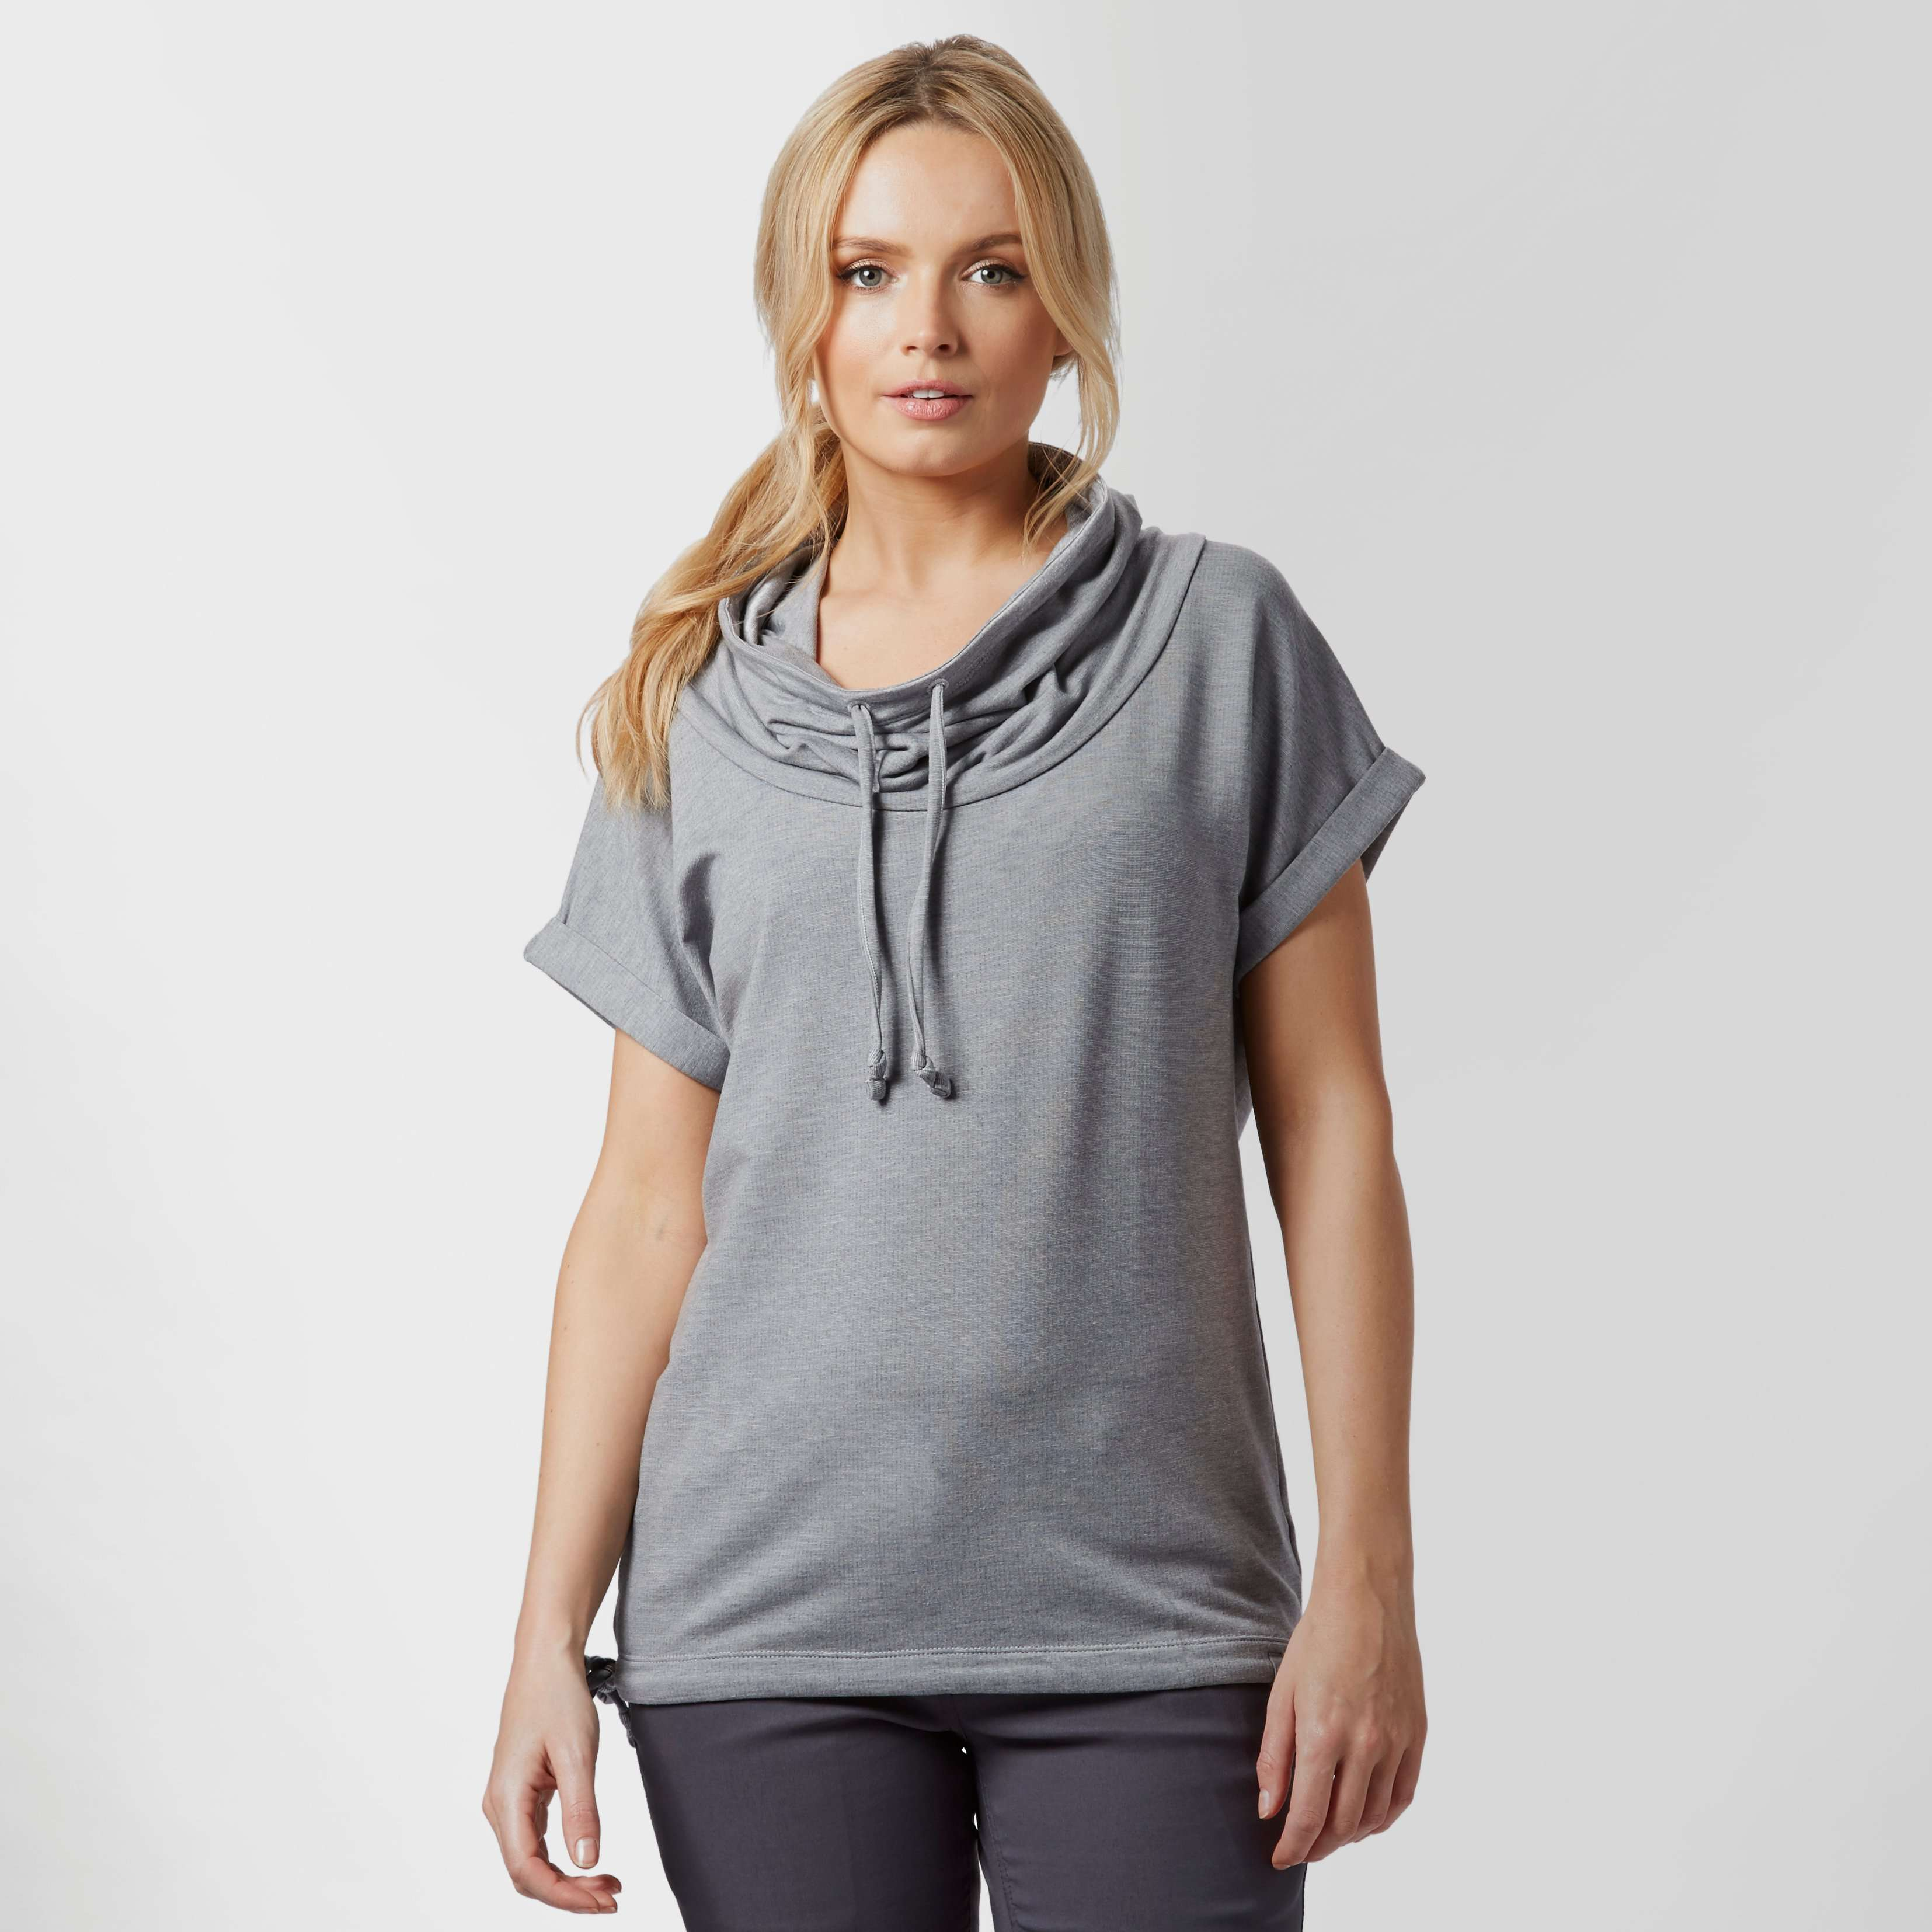 ICEBREAKER Women's Mira Short Sleeve Hoodie